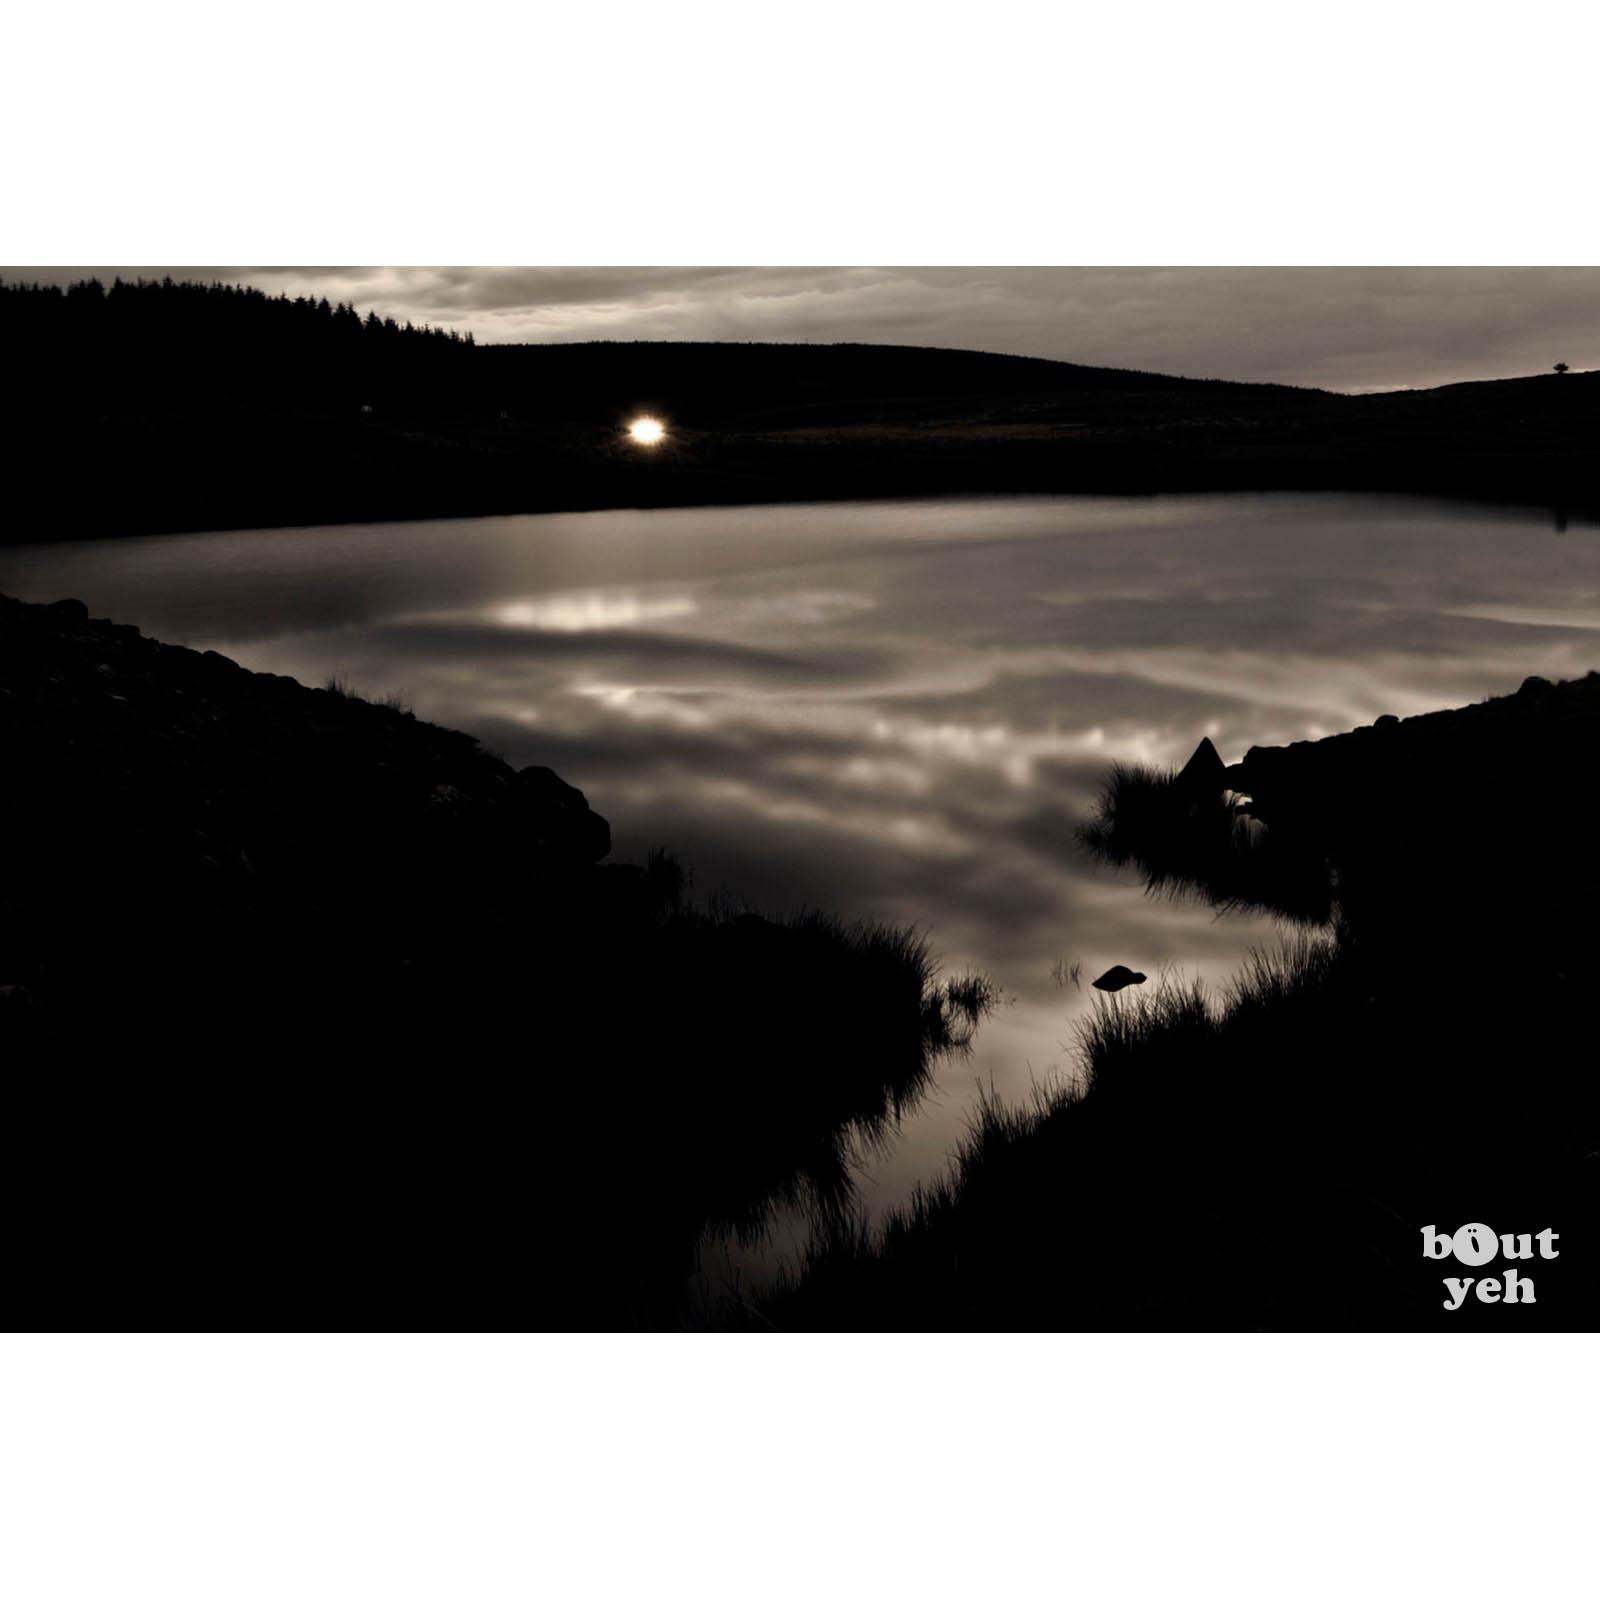 Loughareema The Vanishing Lake - photo 1778 by Bout Yeh